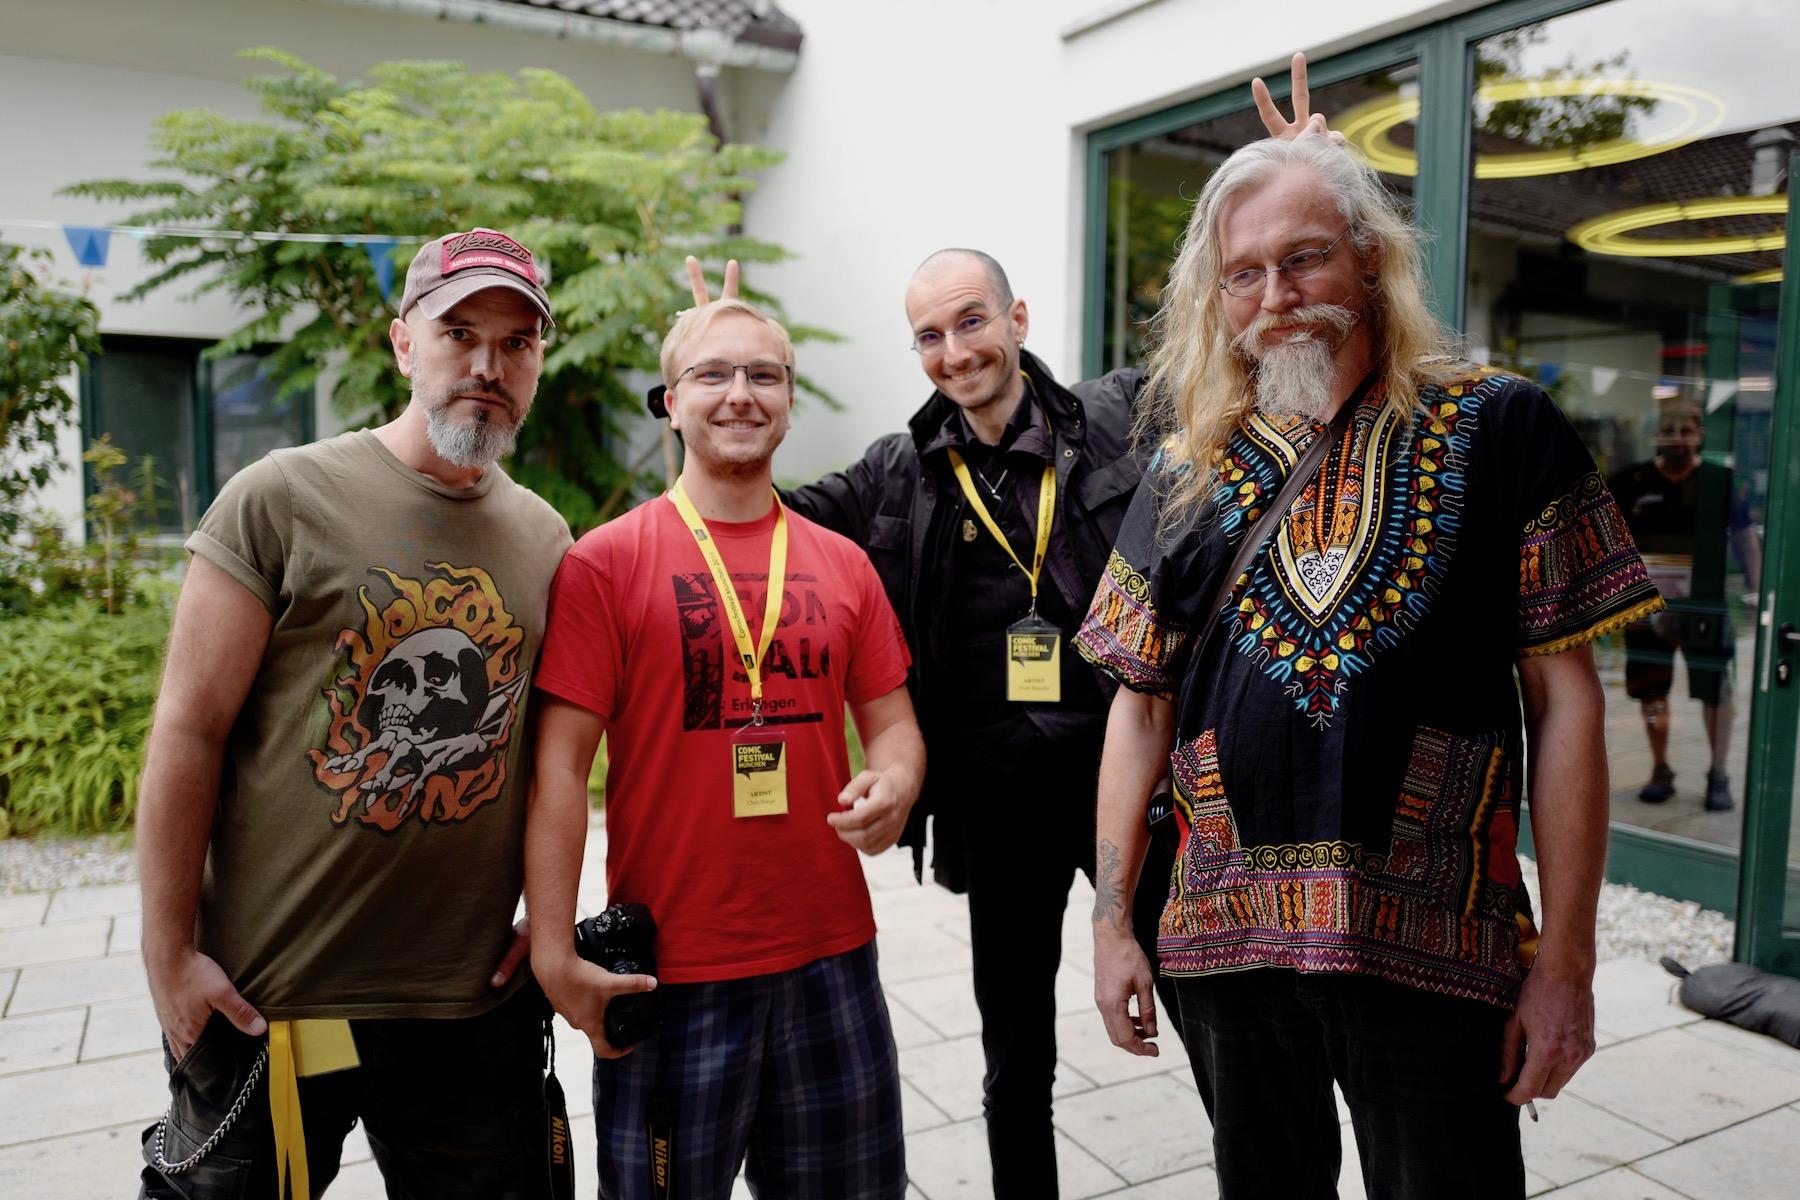 mark_benecke_cfm19_comic_festival_muenchen_u_comix - 14.jpg